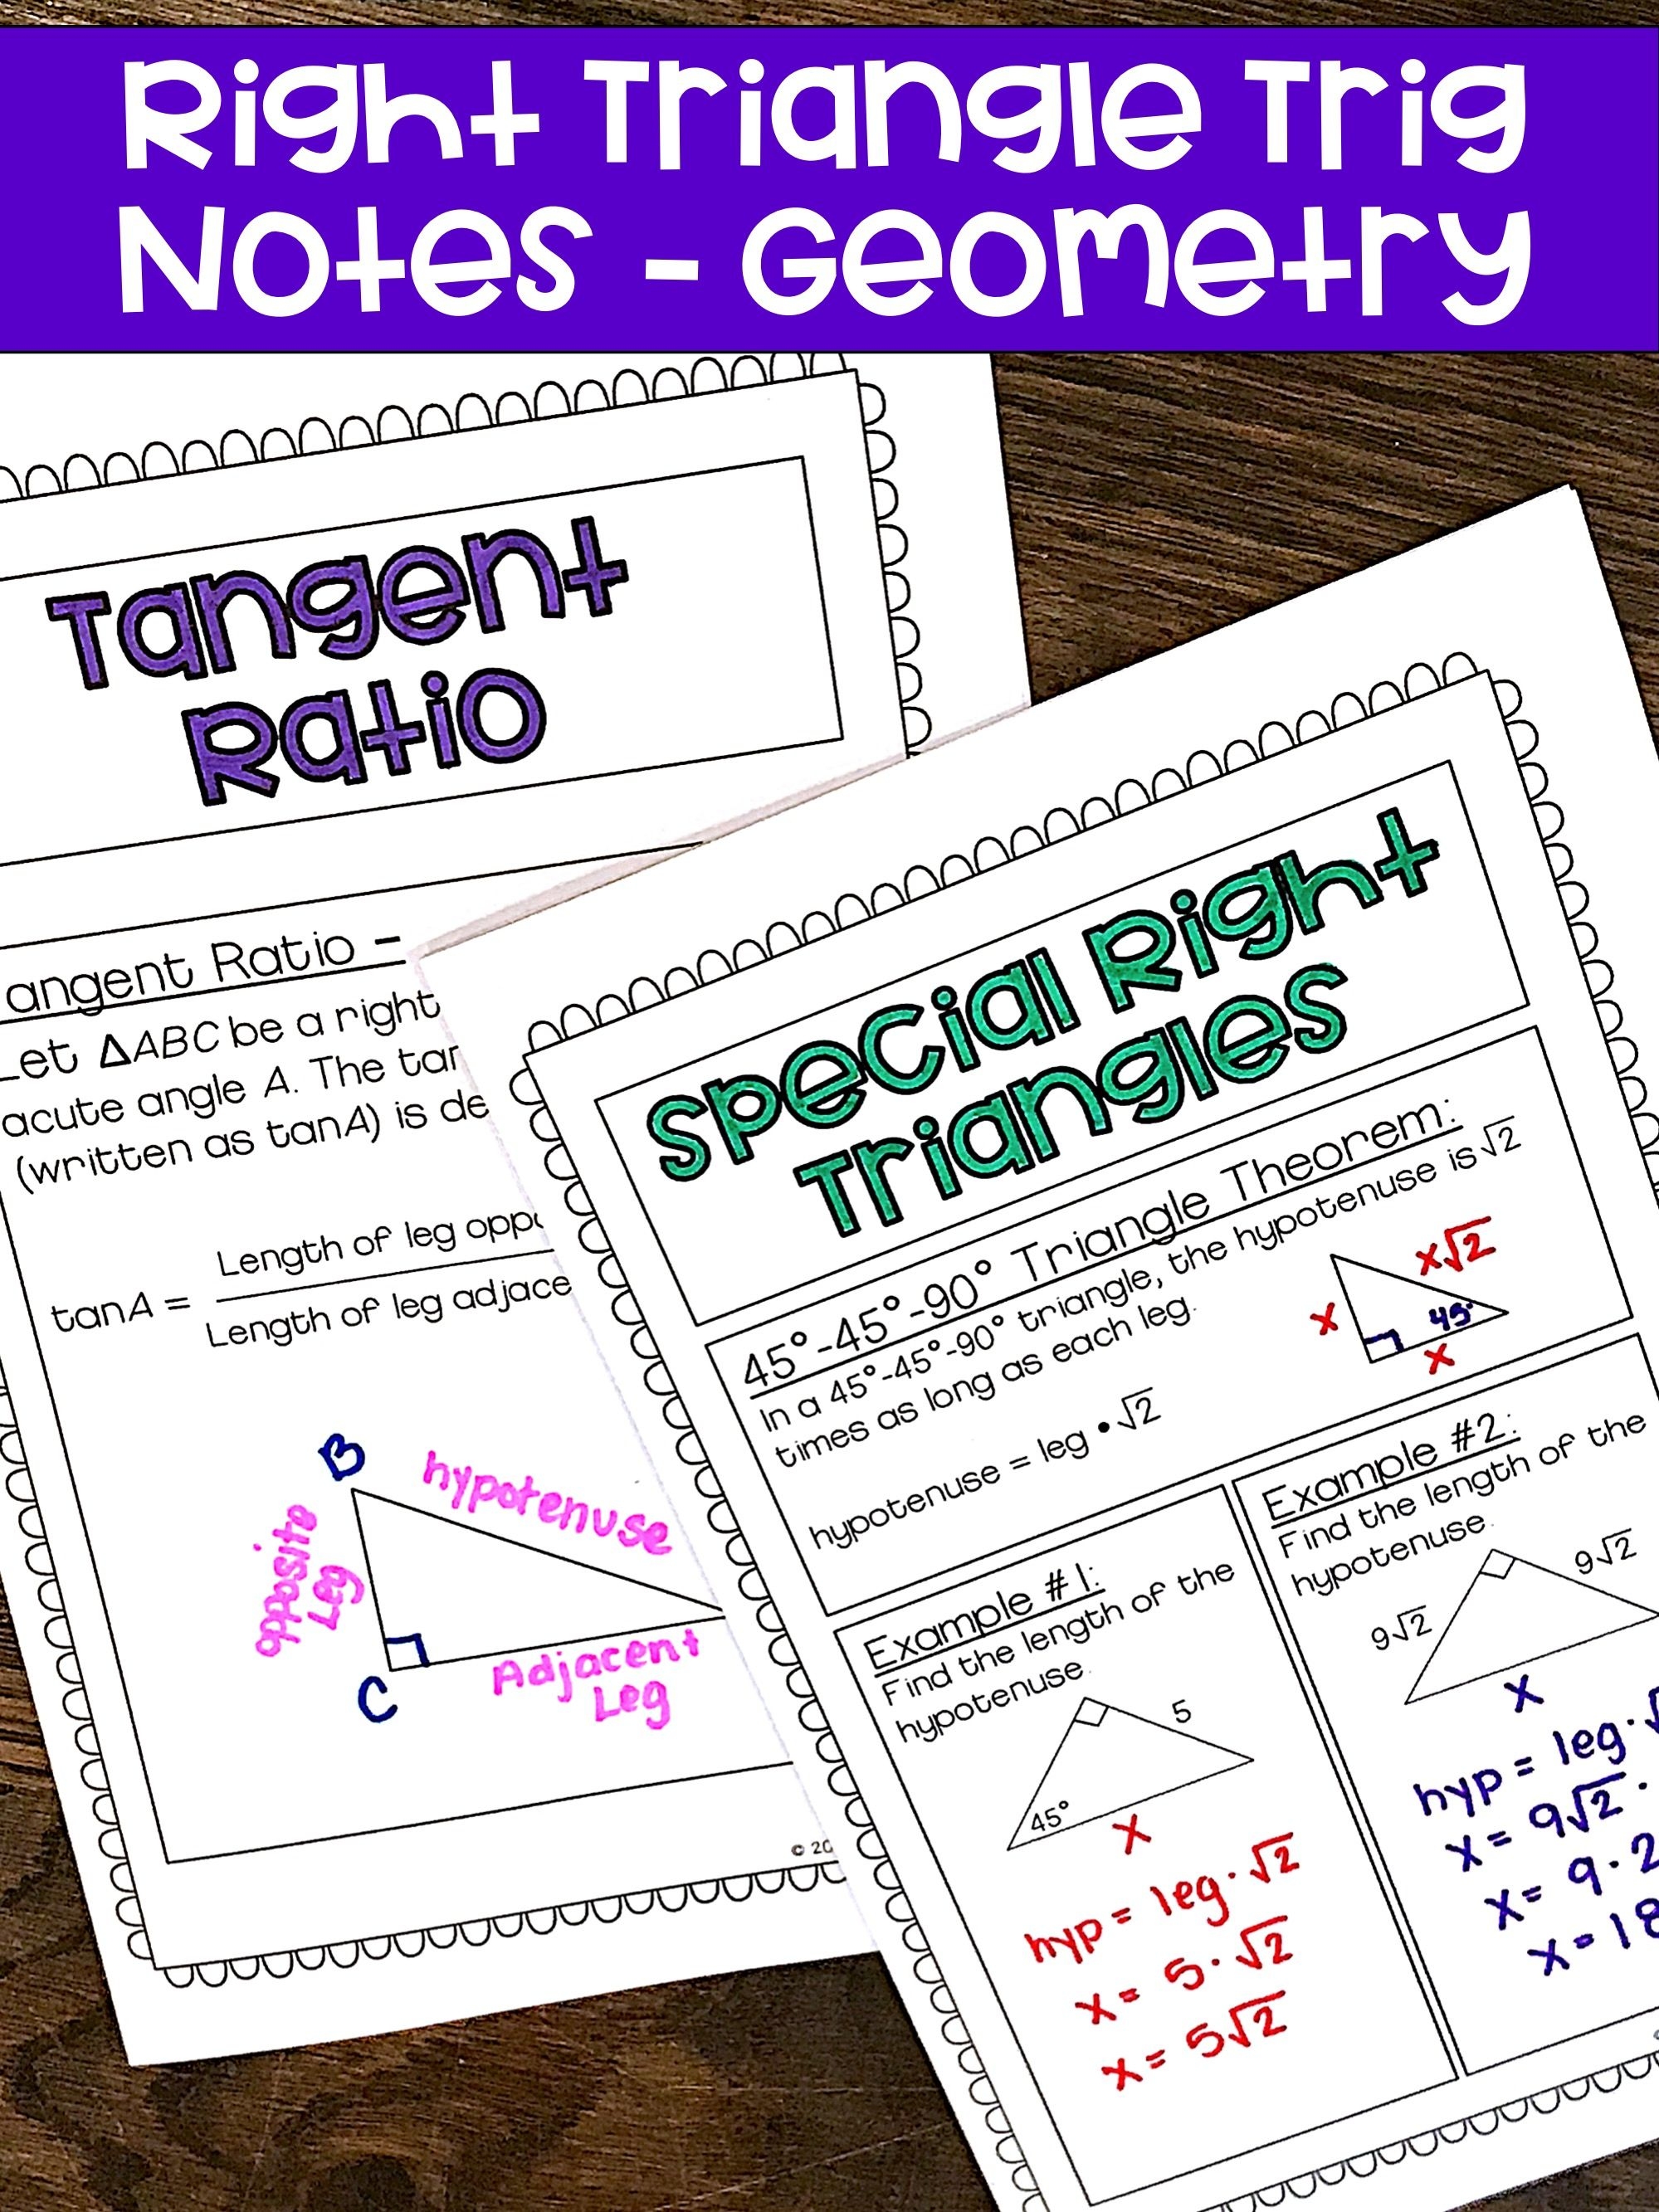 Right Triangle Trigonometry Geometry